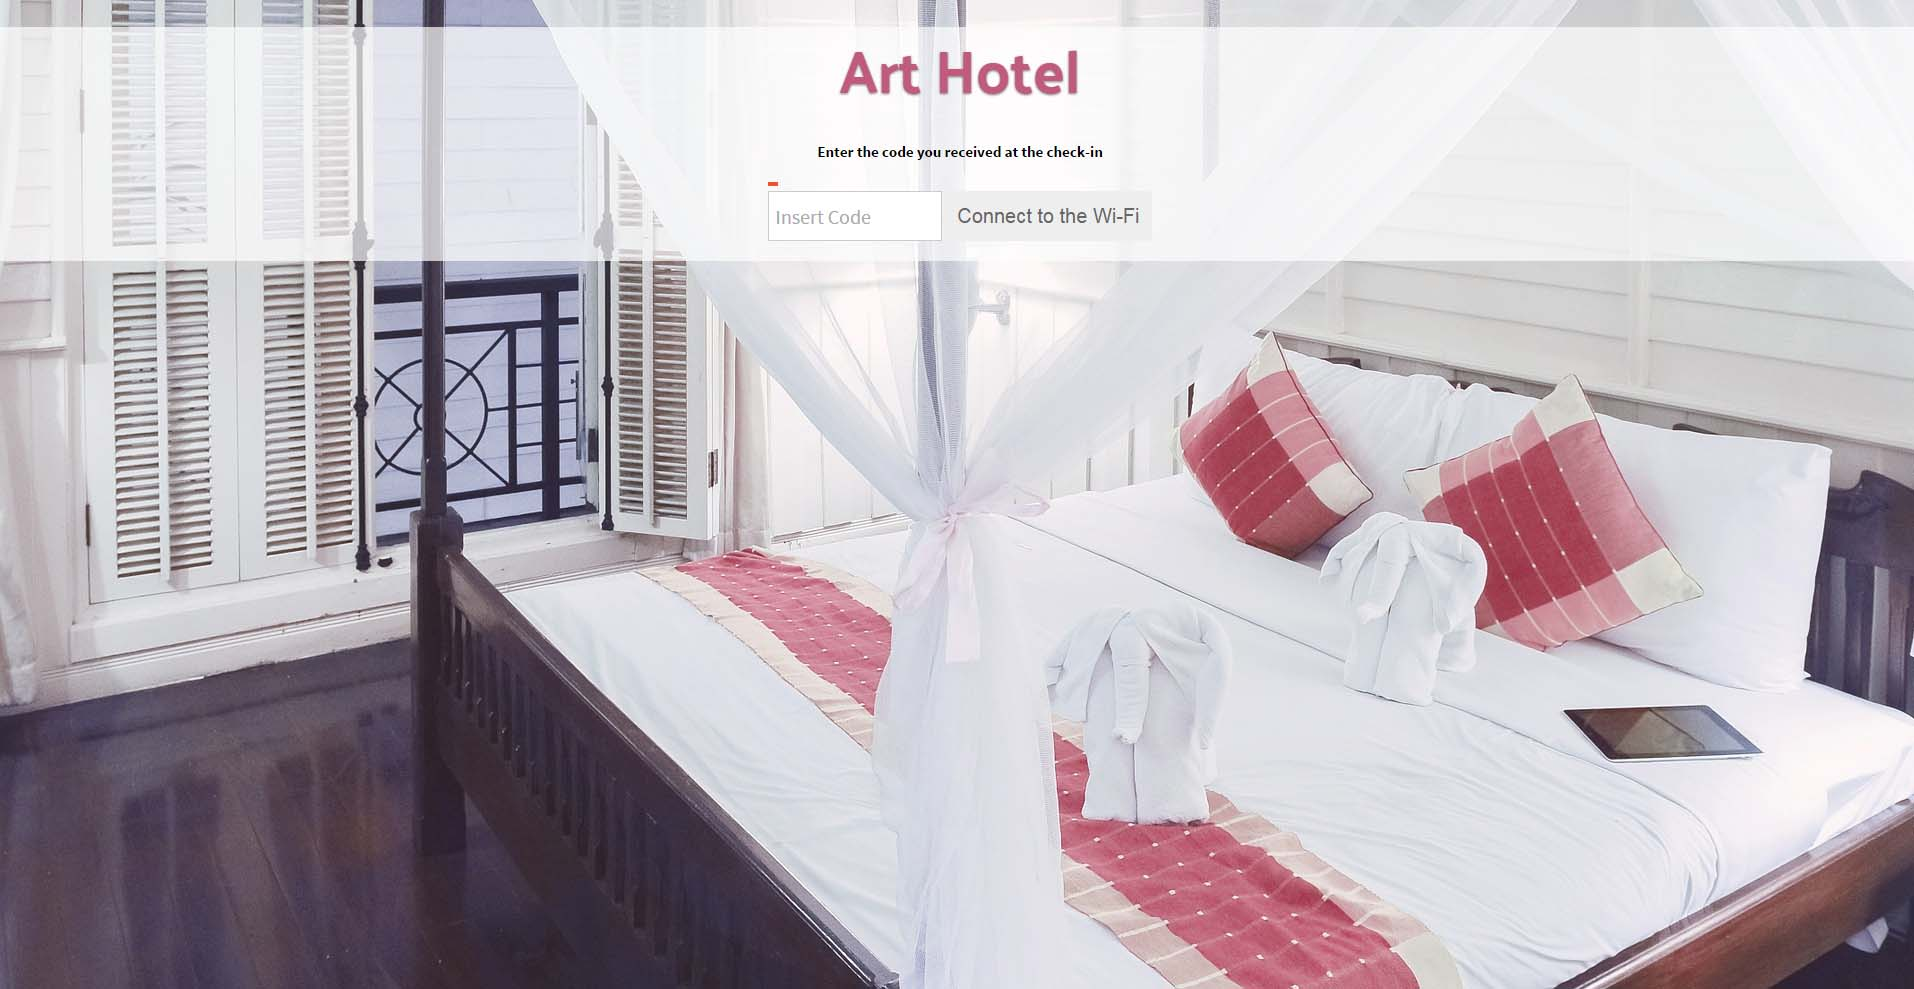 WiFi for Art Hotel